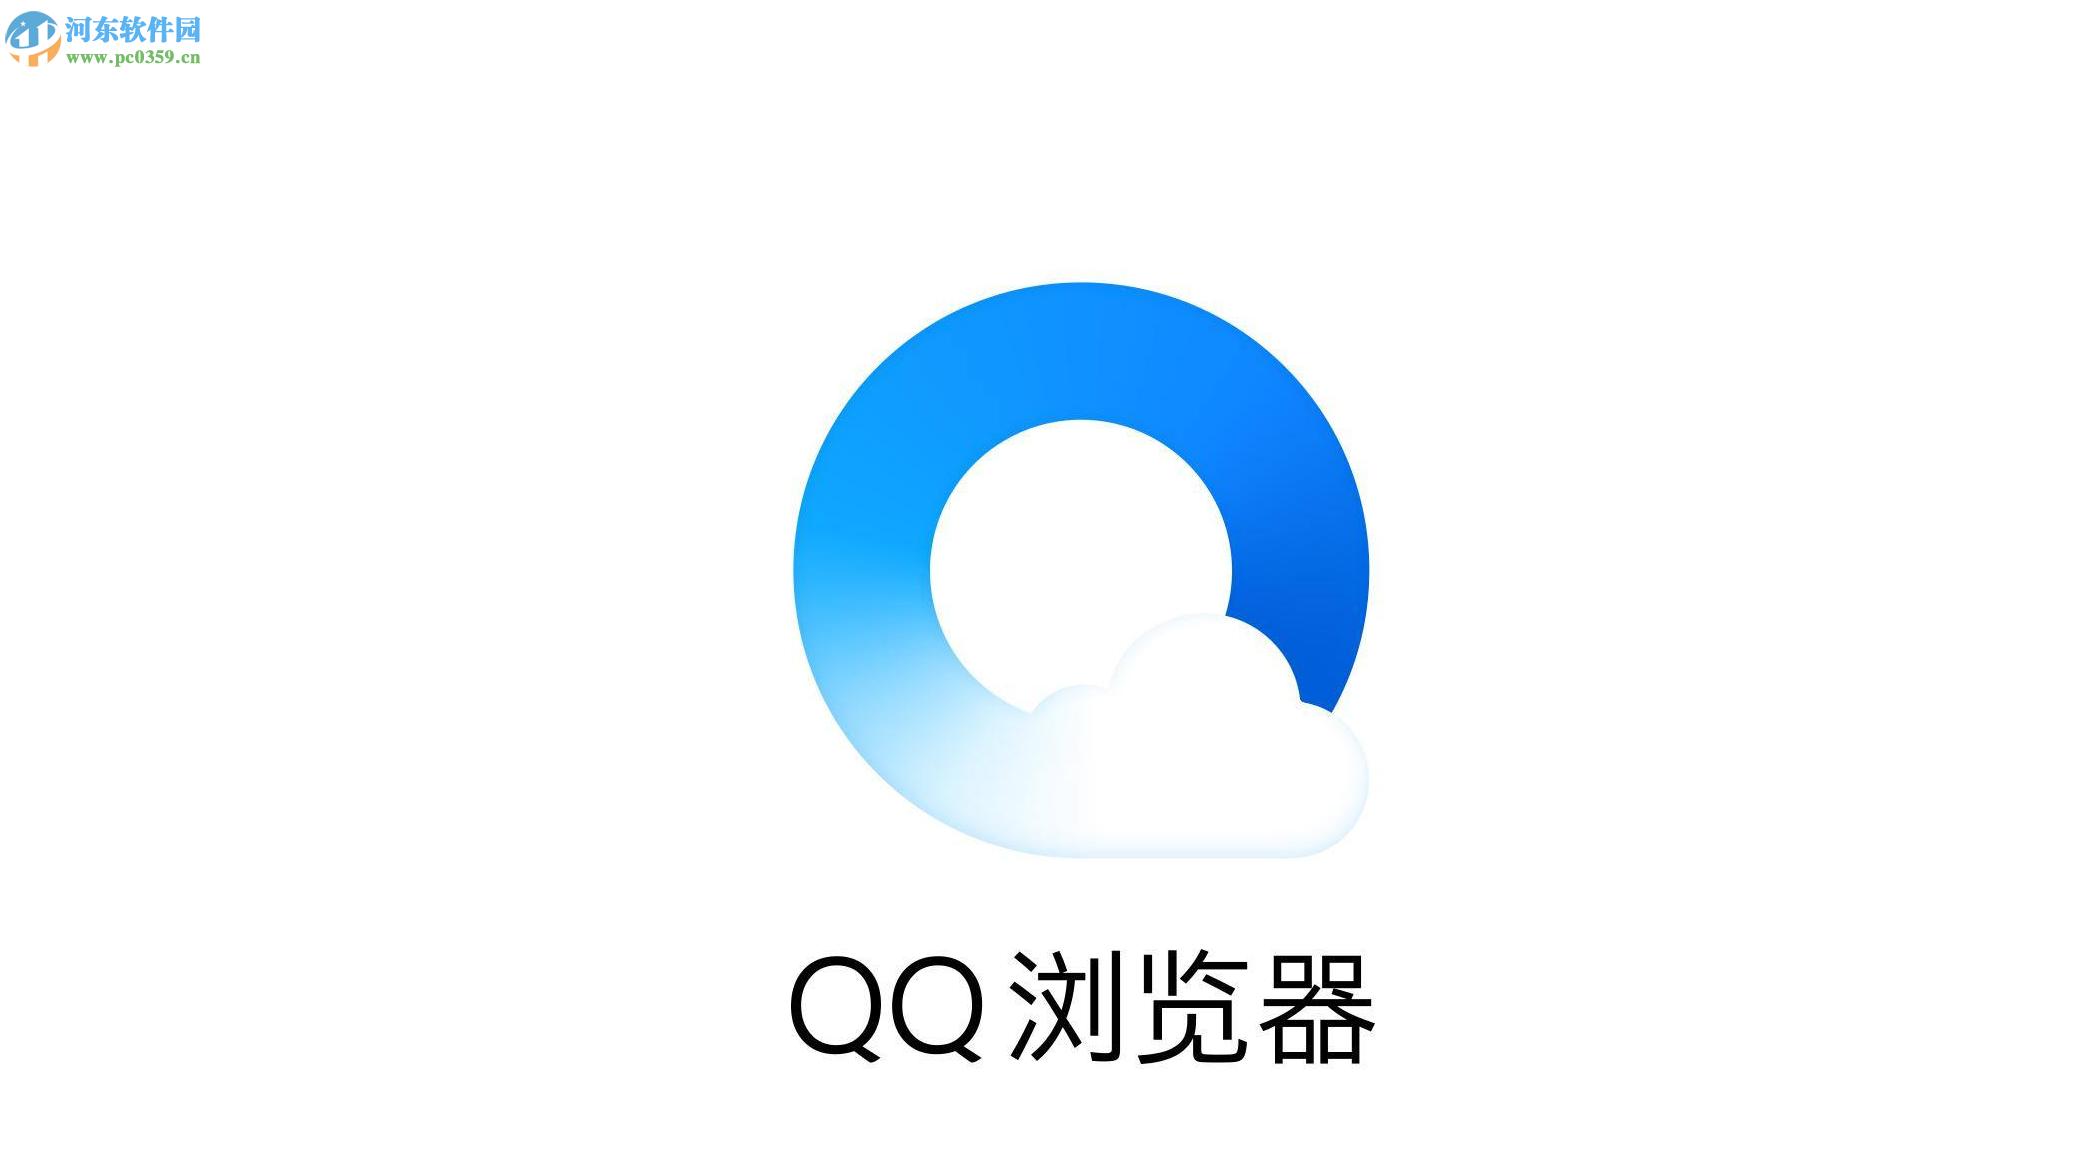 QQ浏览器手机版怎么把网页添加到手机桌面